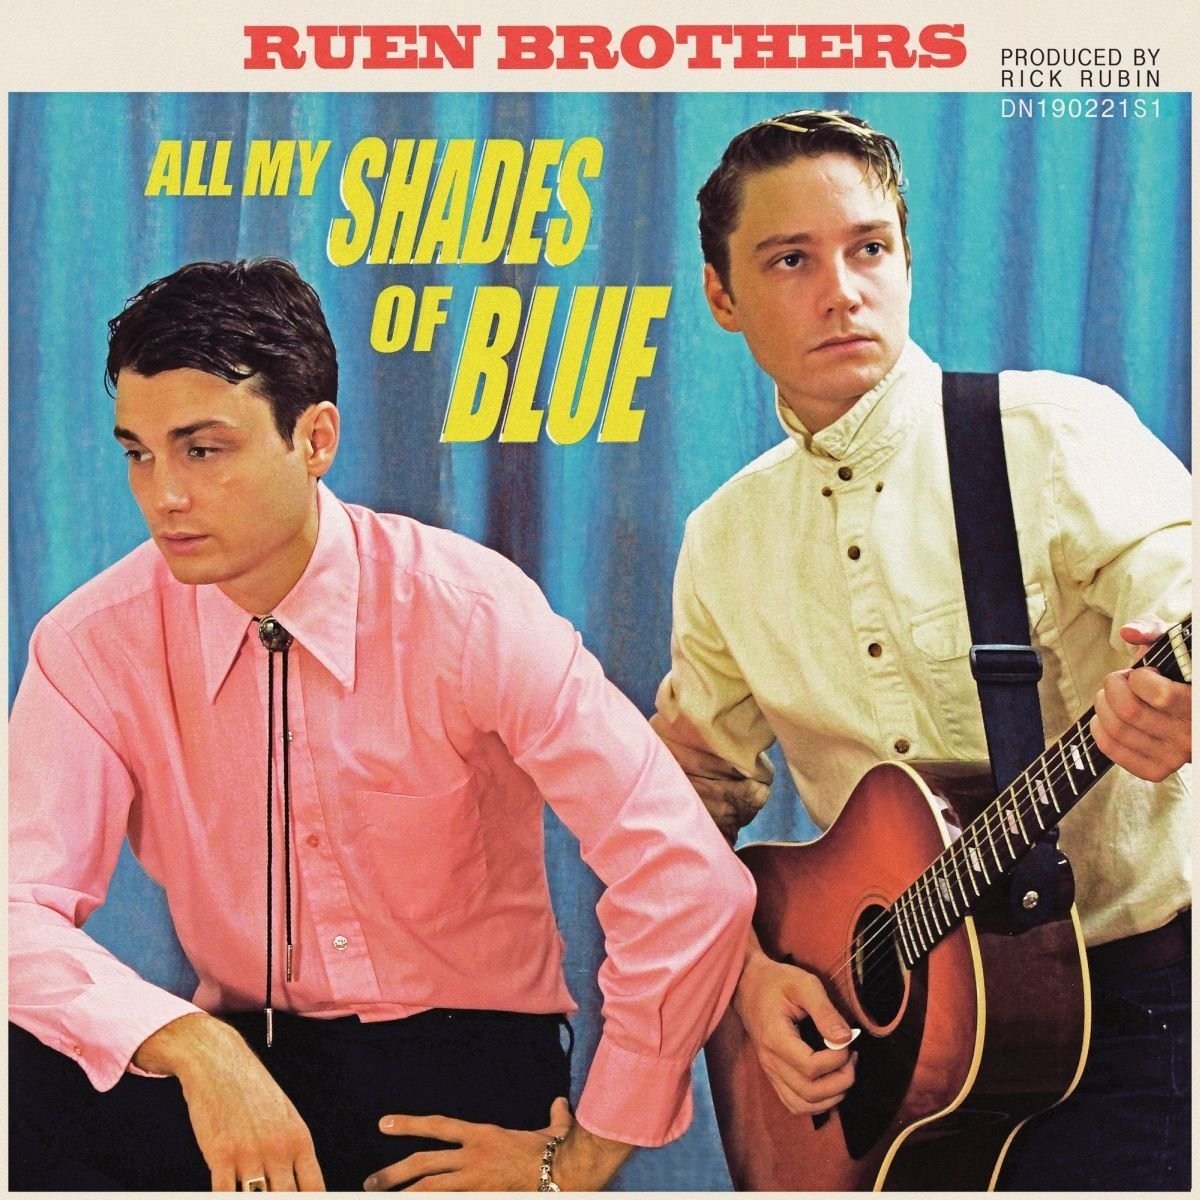 Ruen Brothers - All My Shades of Blue (2018) 81qgRxbWgEL._SL1200_